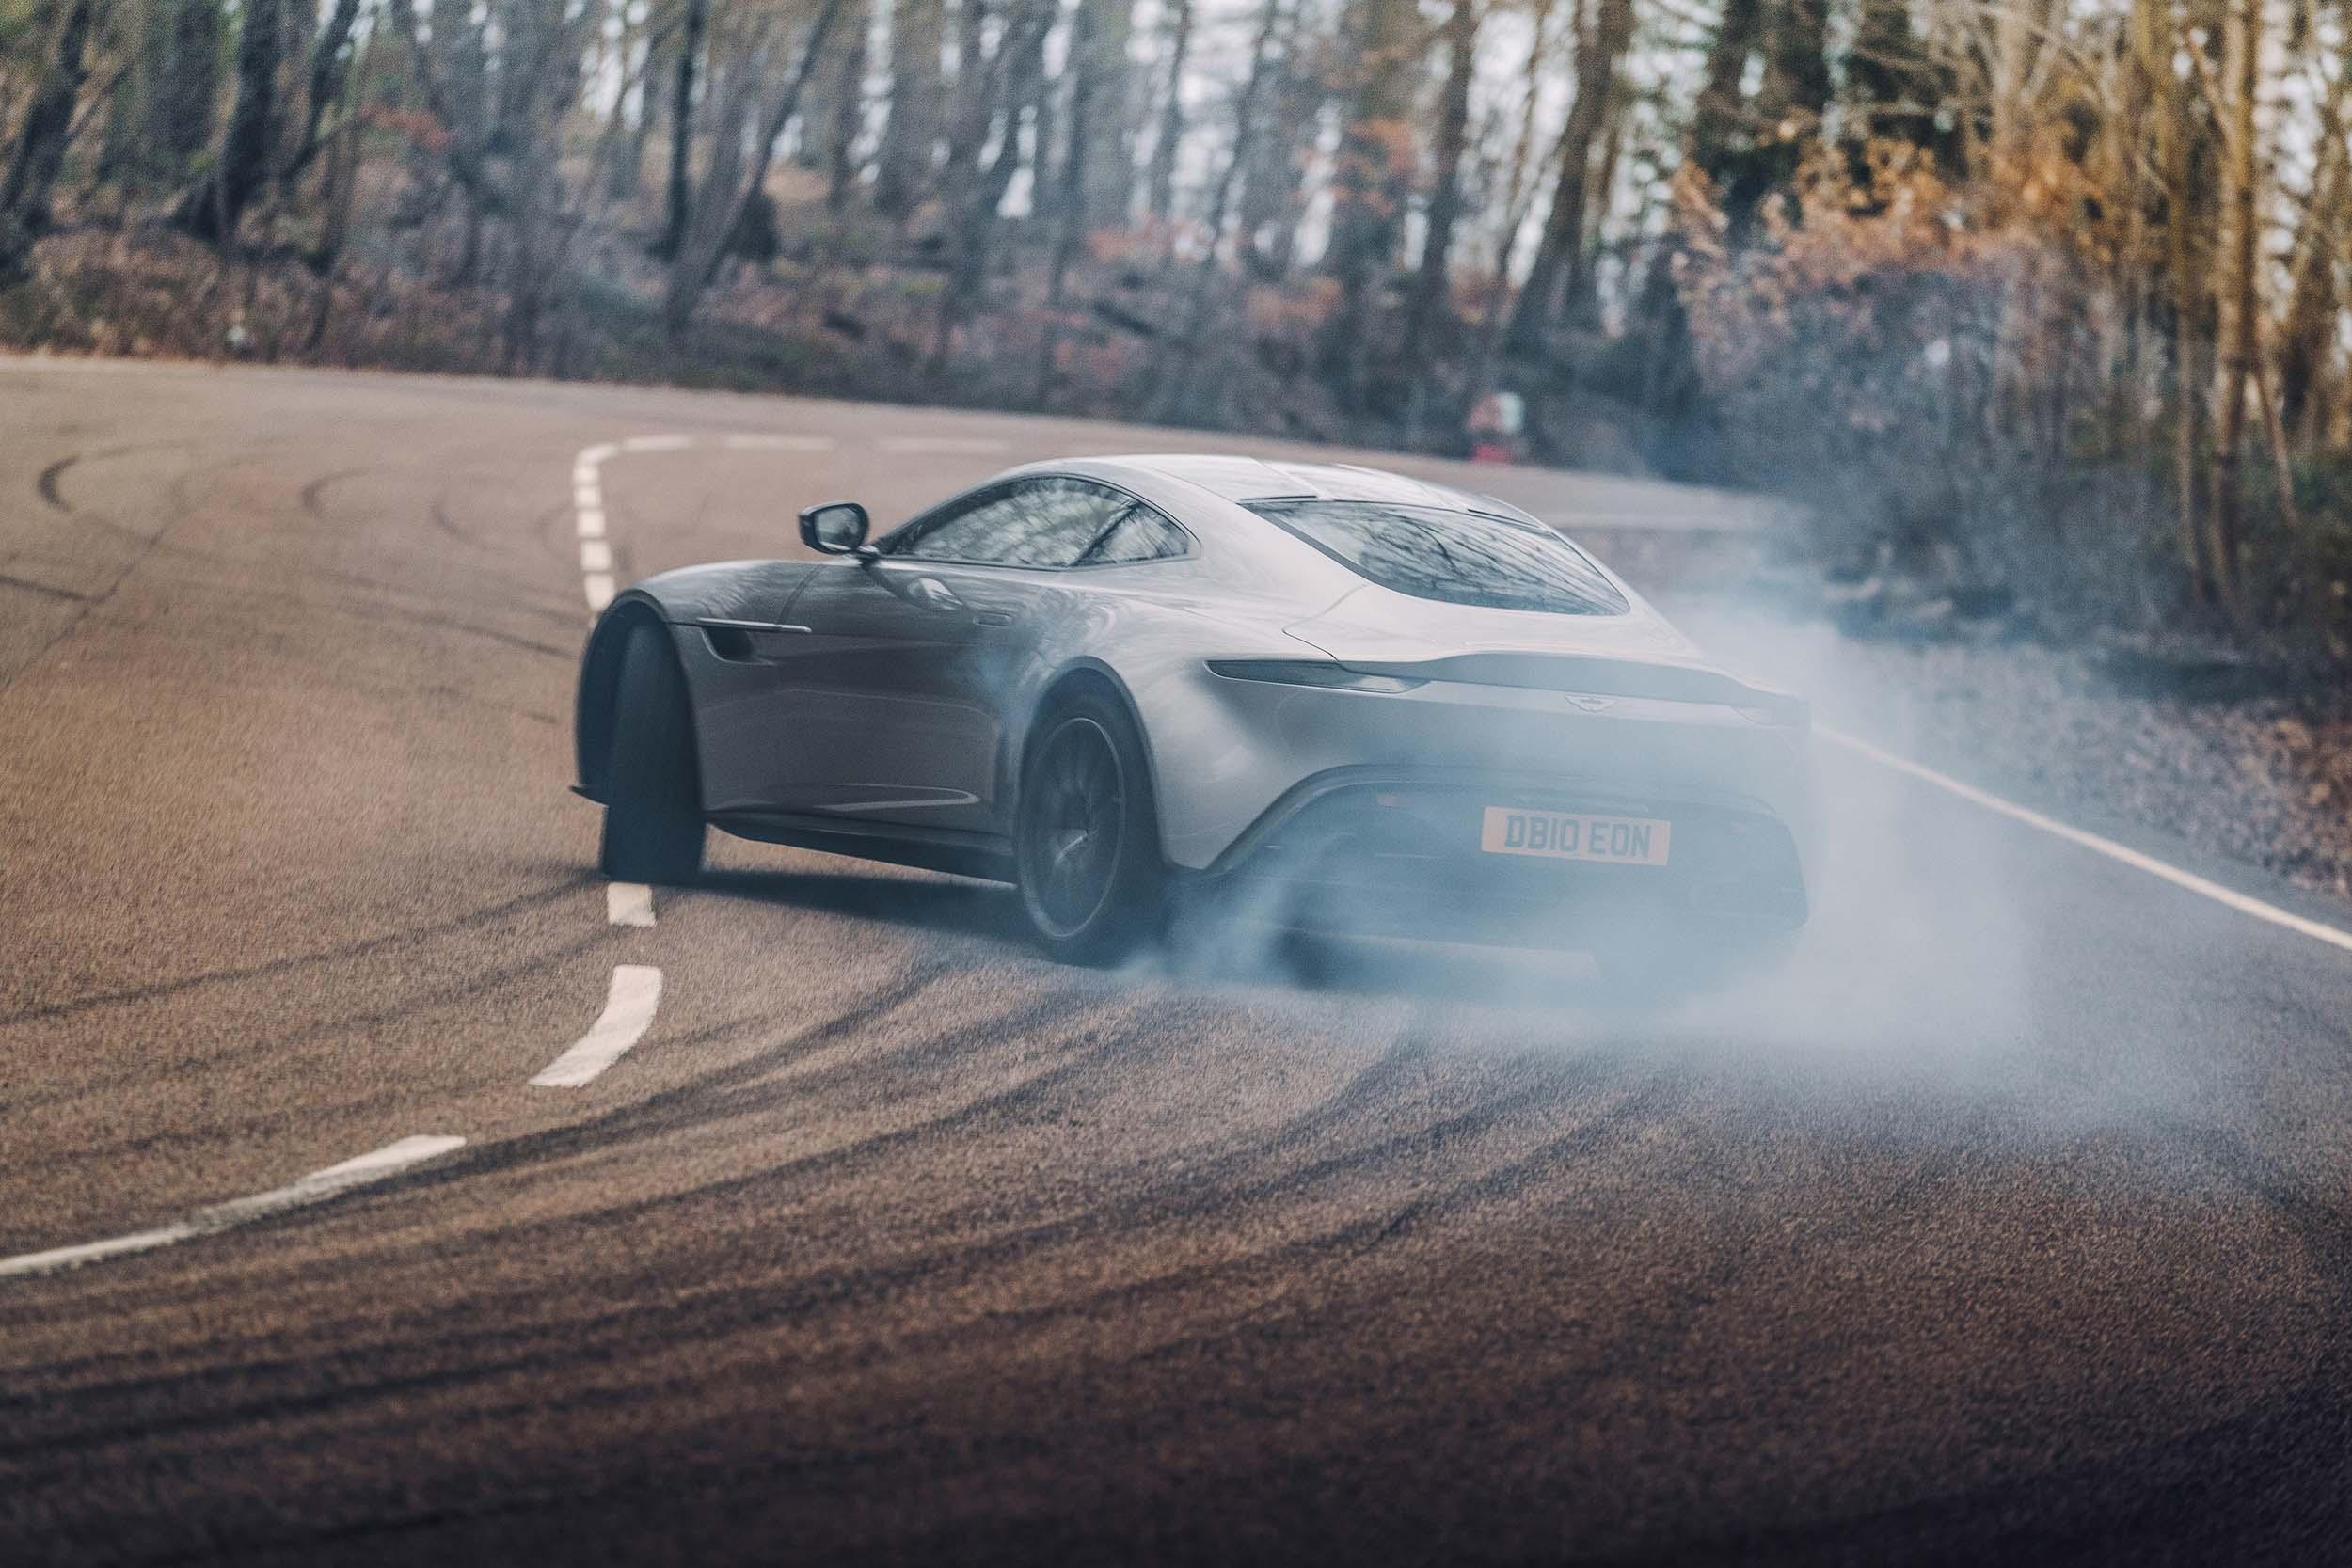 Driftende Aston Martin DB10 van James Bond (007)